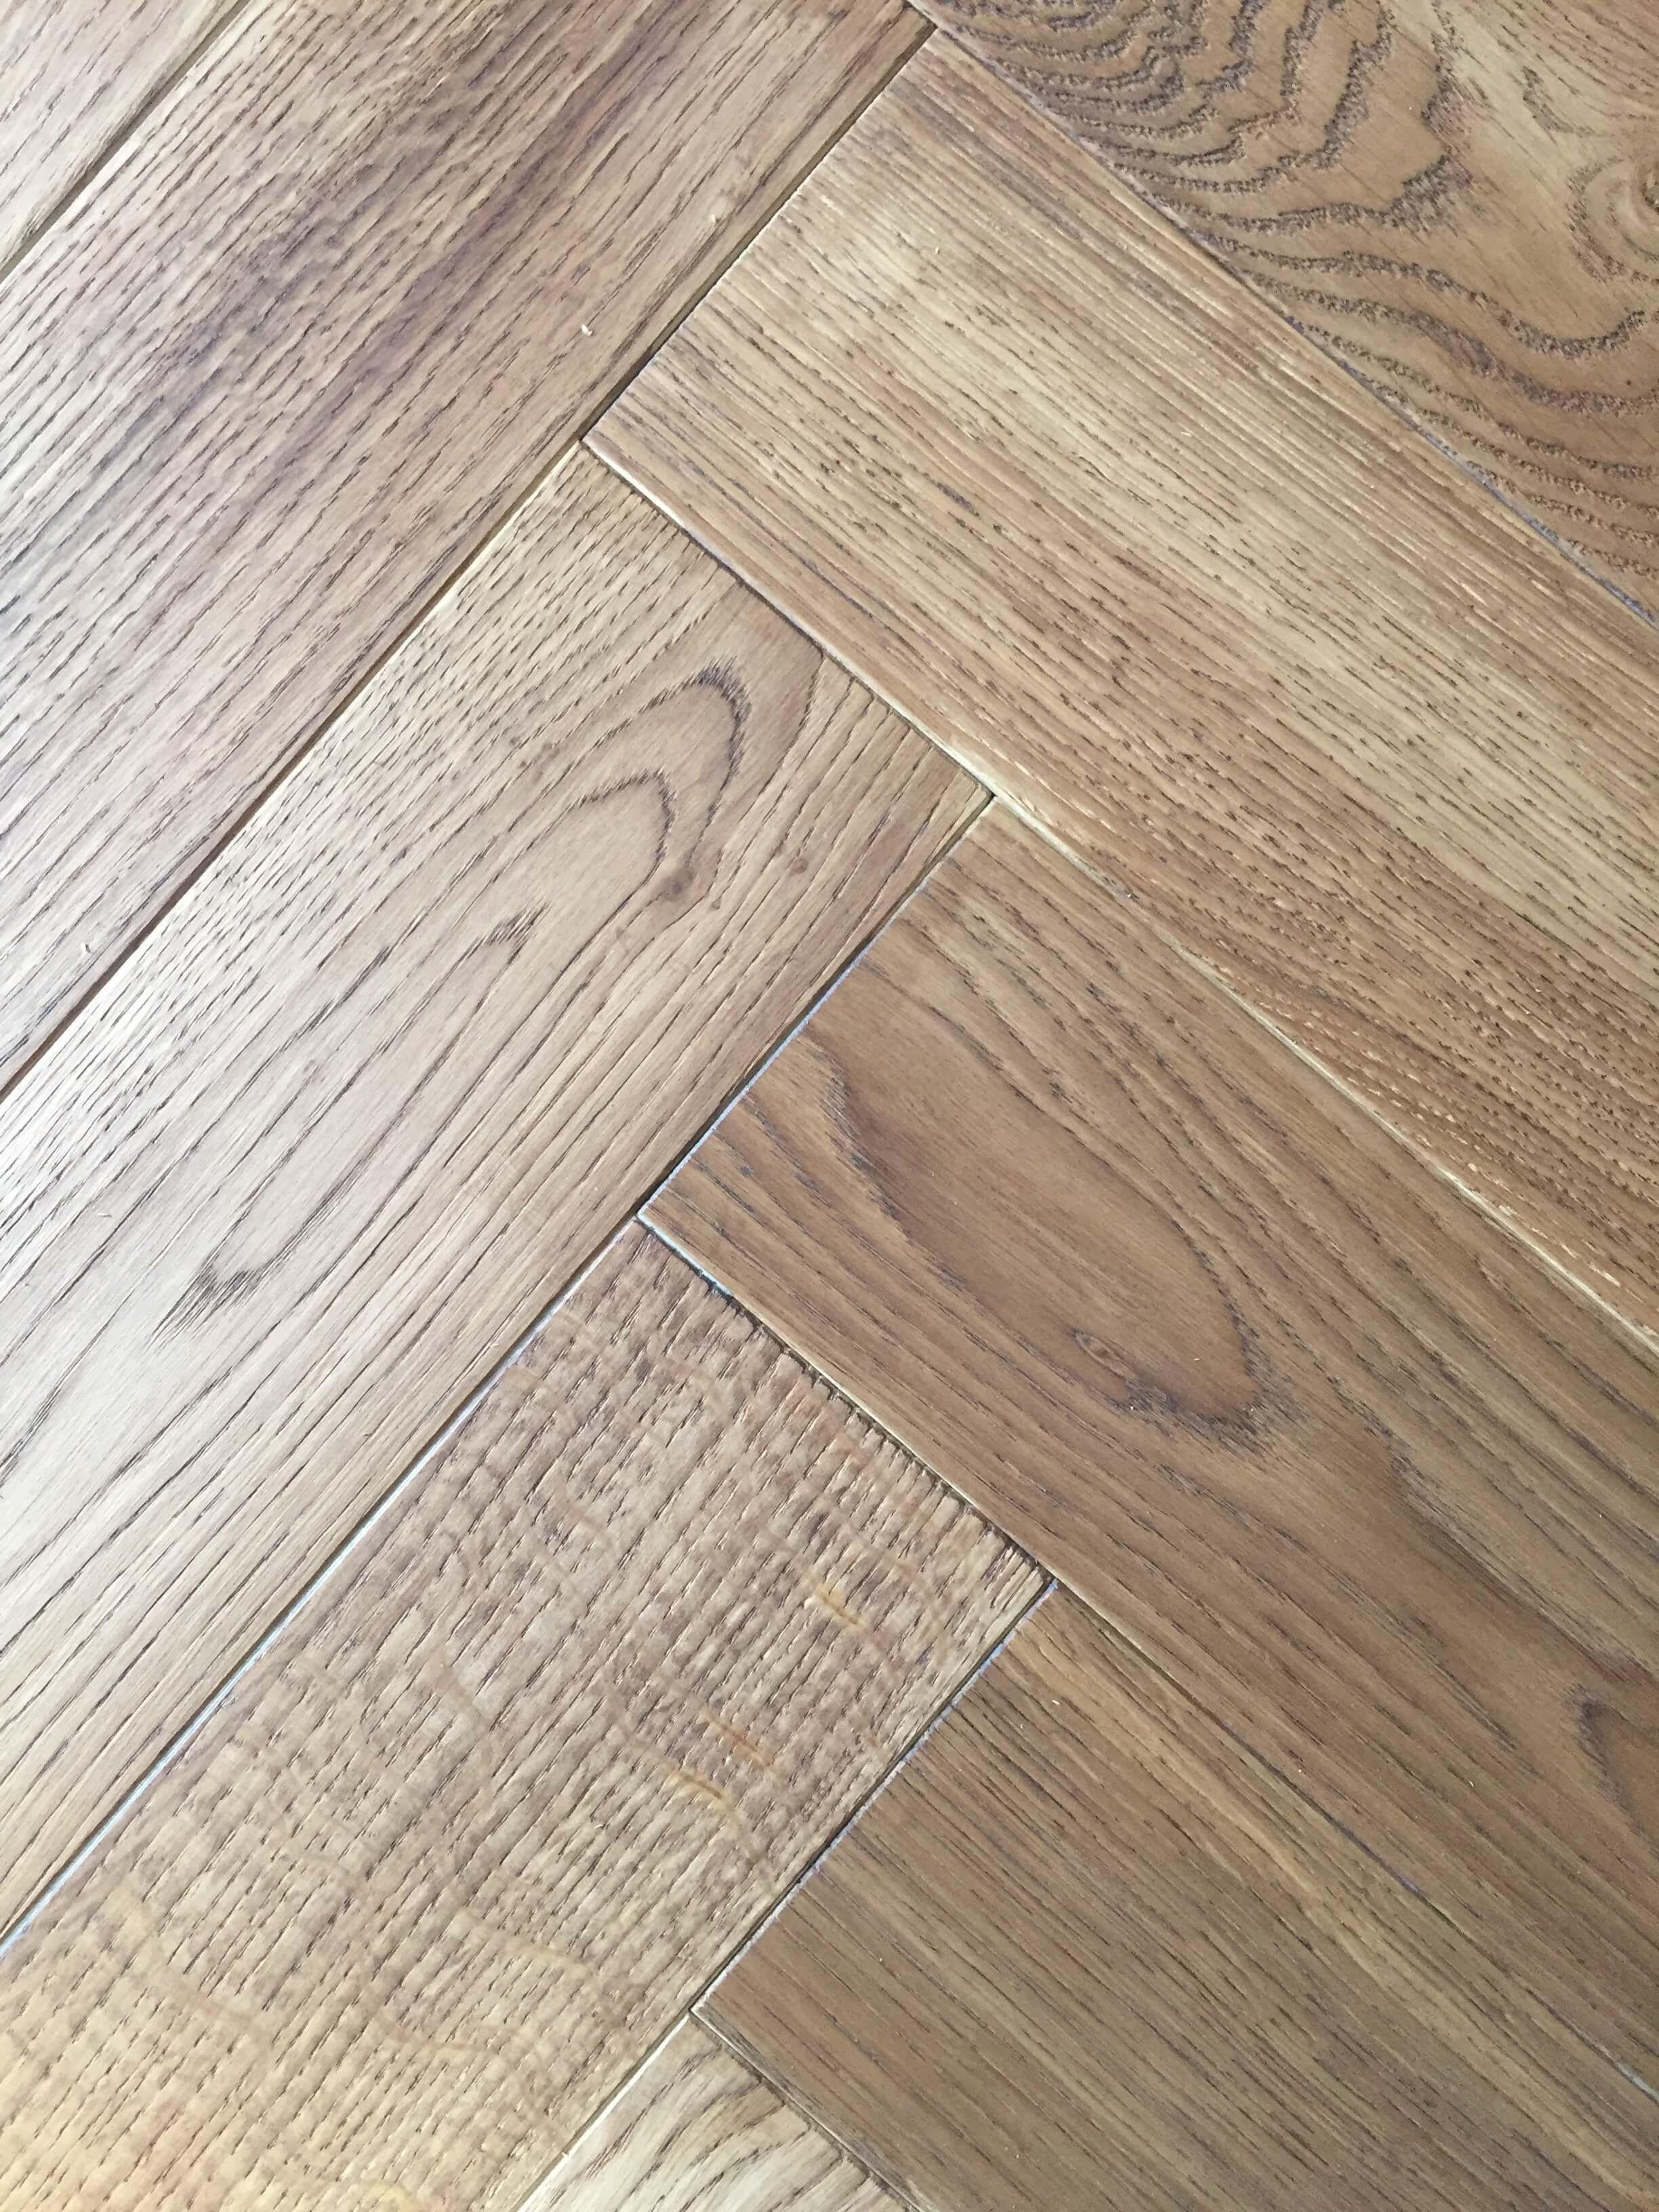 hardwood flooring prices toronto of handscraped engineered hardwood awesome engineered wood flooring intended for handscraped engineered hardwood awesome engineered wood flooring brown maple hand scraped engineered images